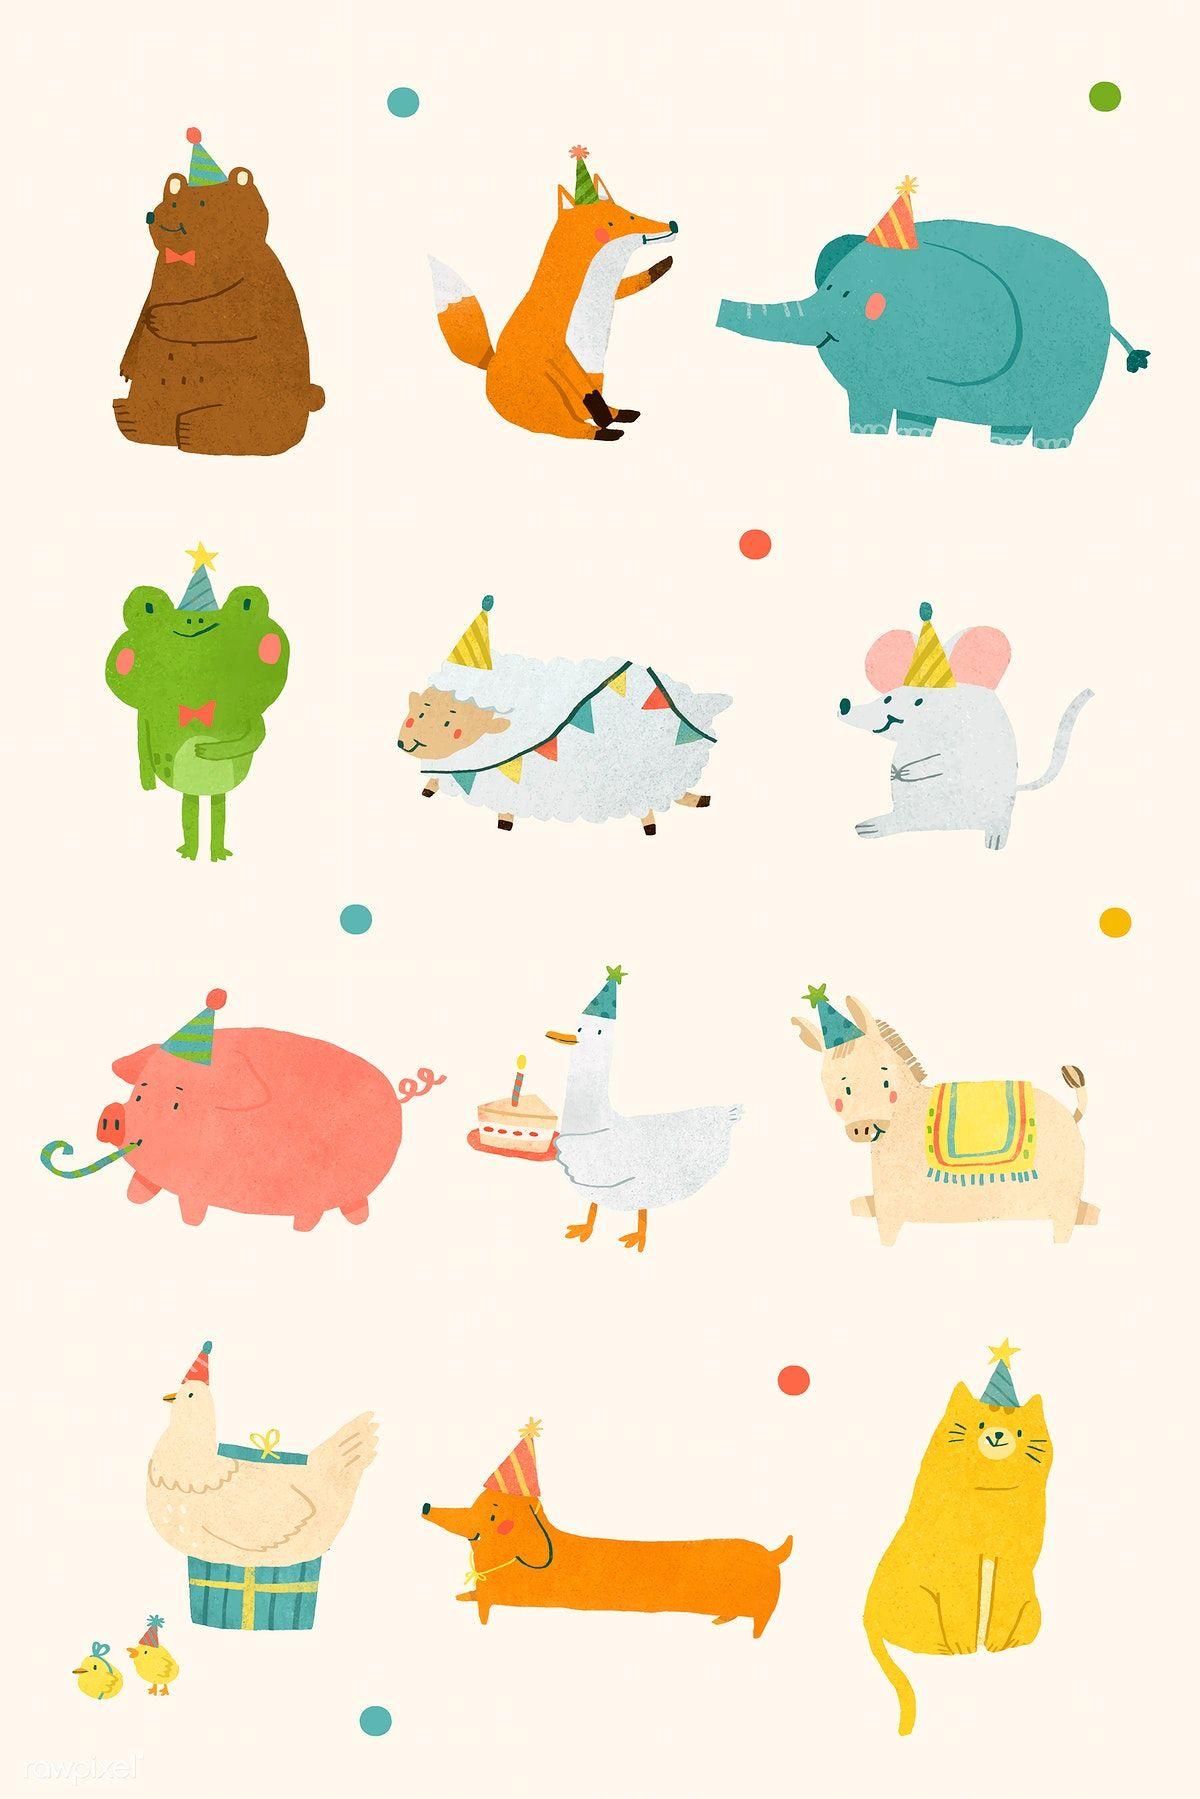 Download premium vector of Festive animals doodle element set vector